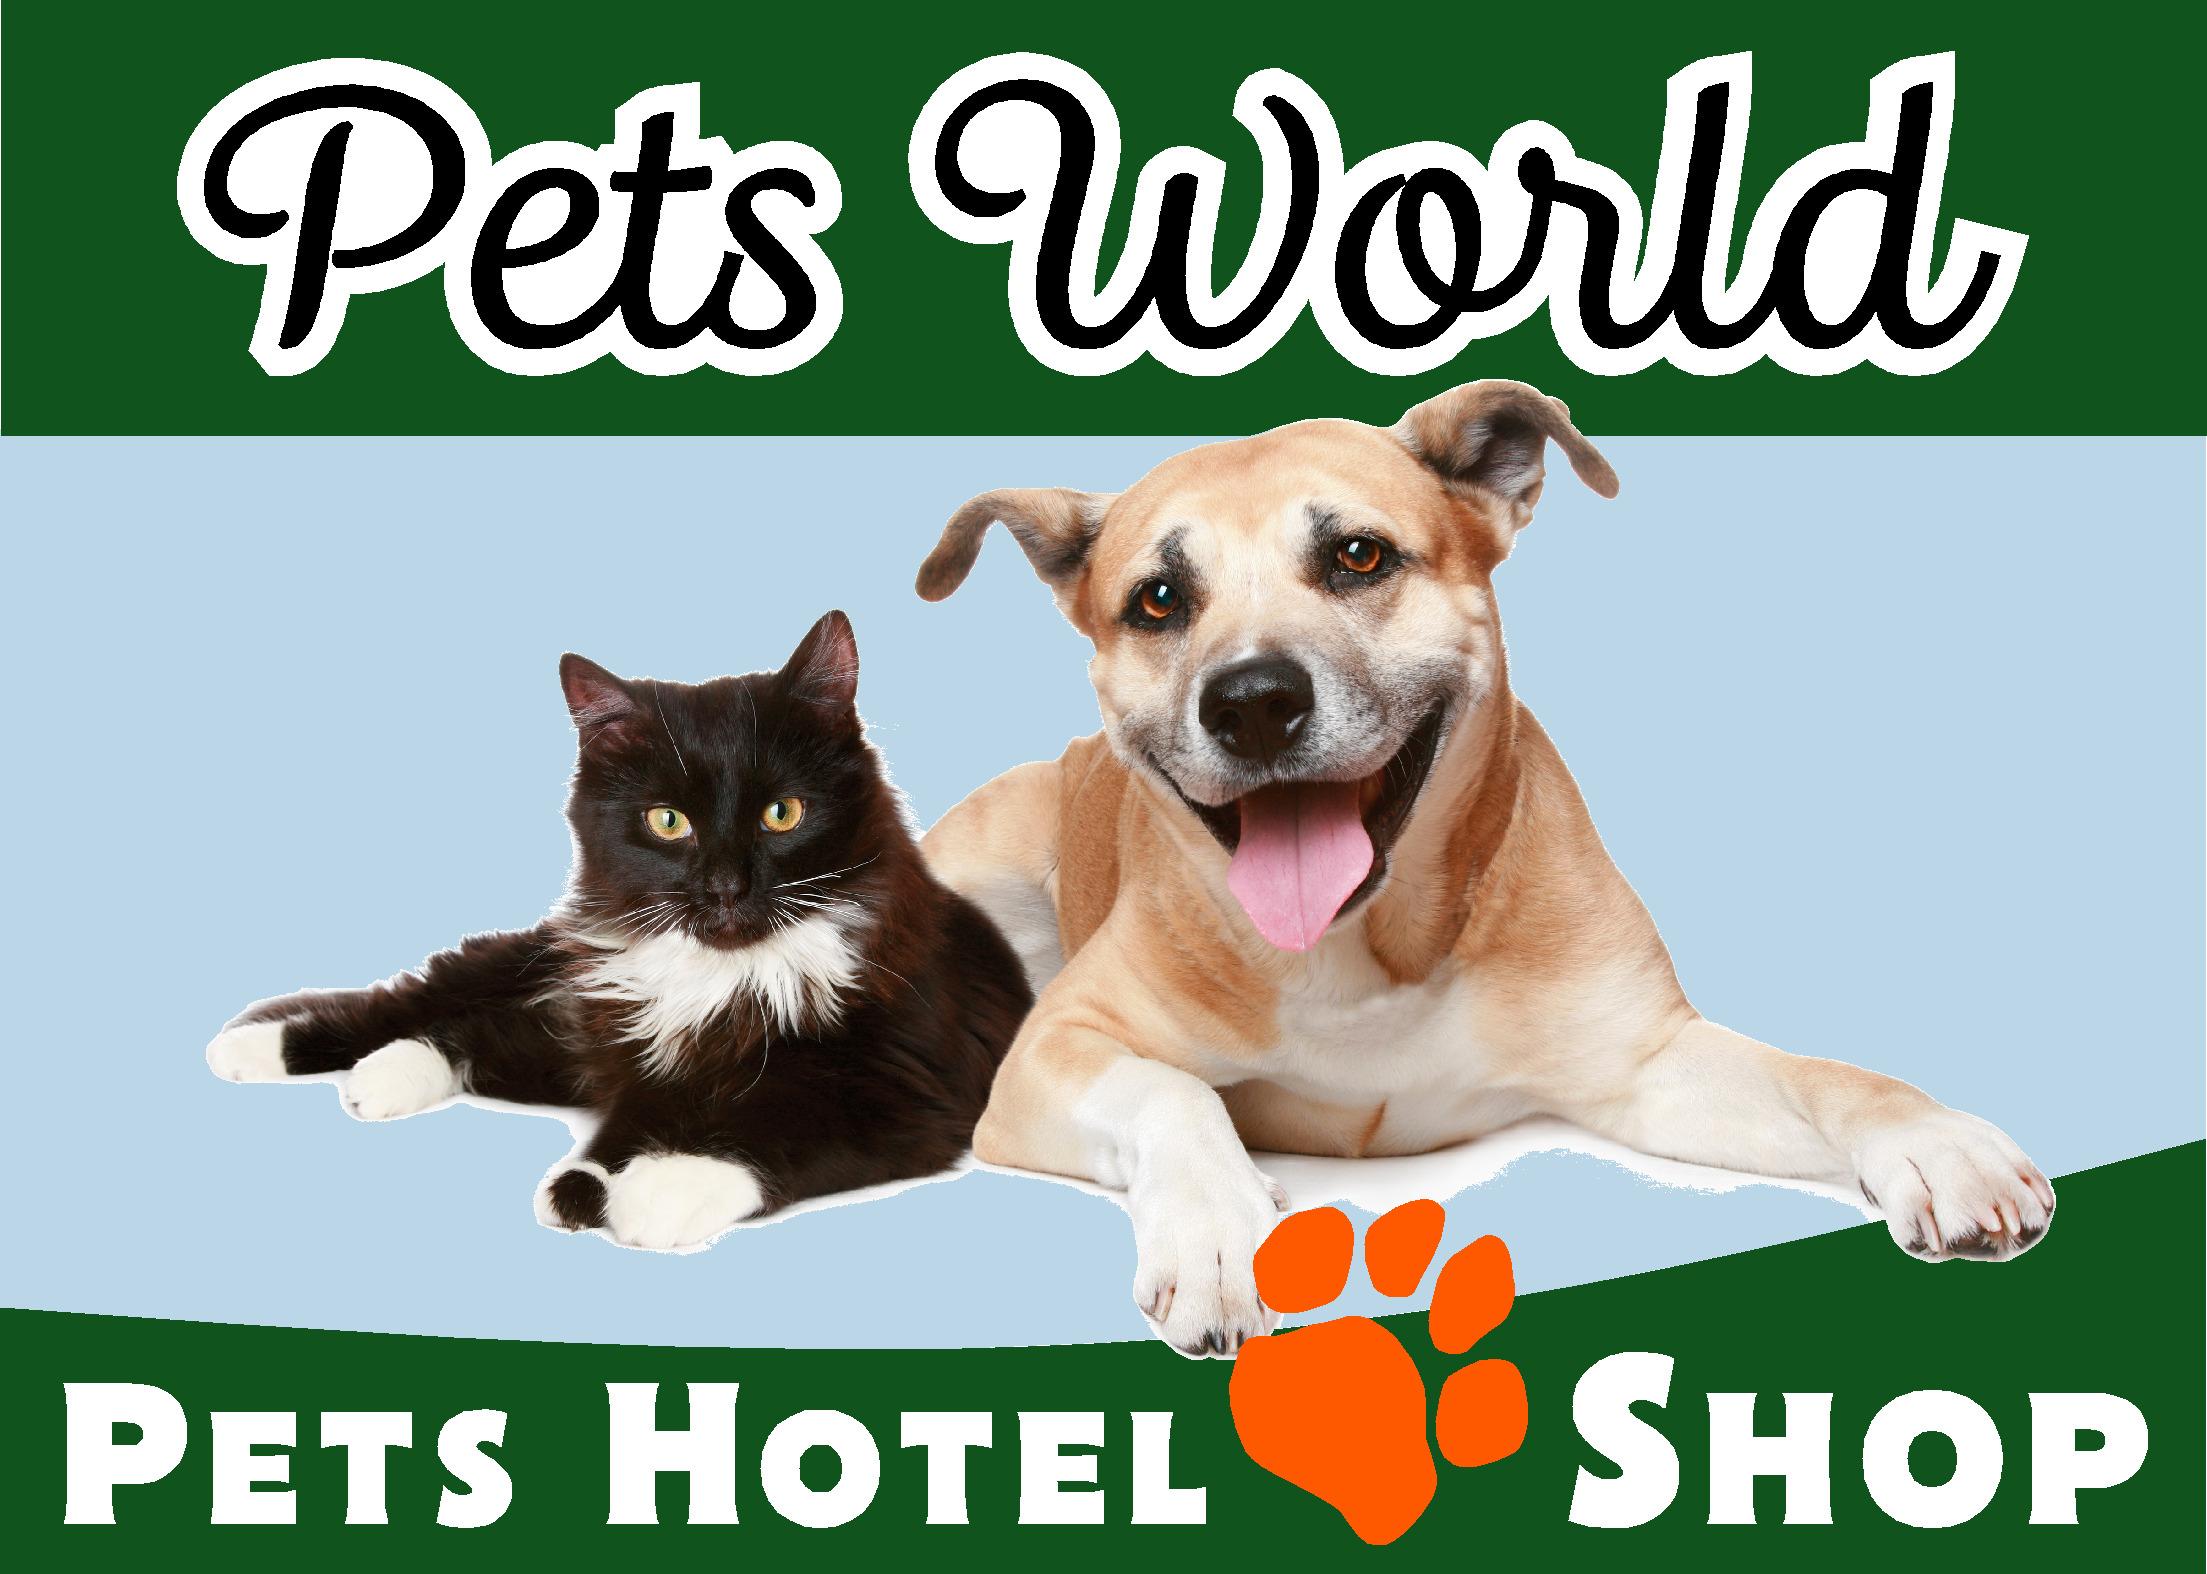 Pets World Kent